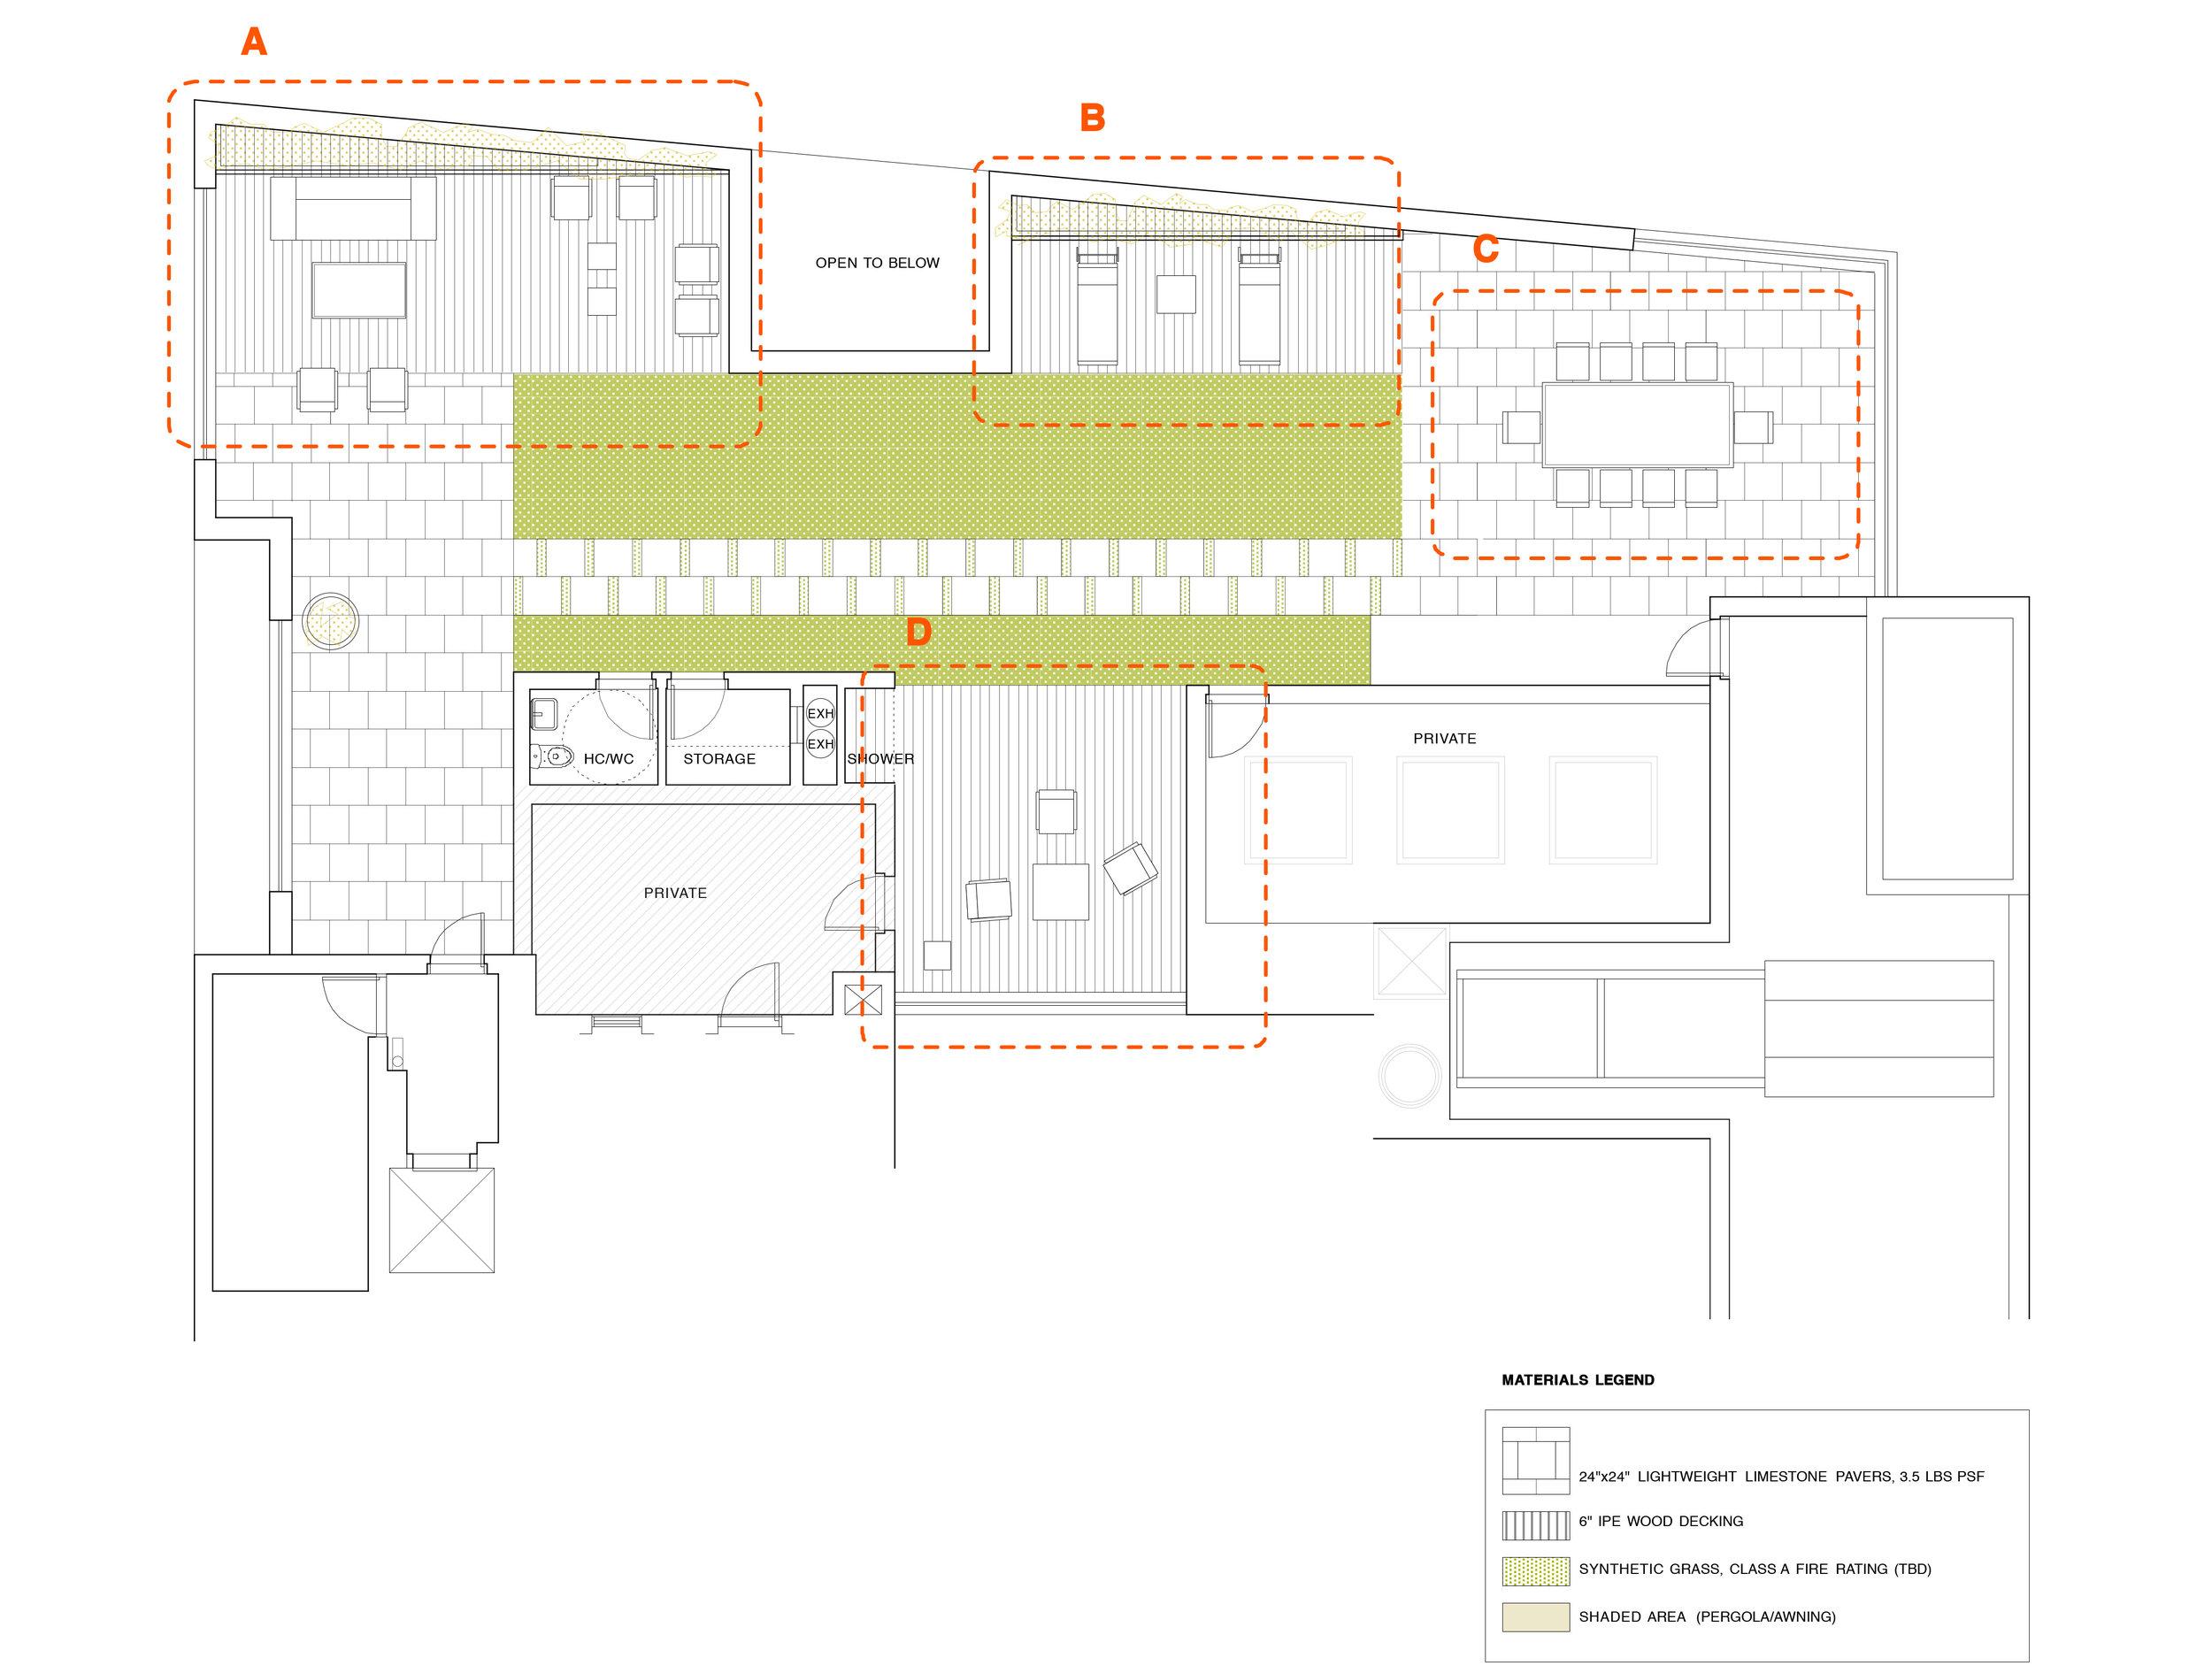 ACHA, Roof Terrace Plan, 285 Lafayette Street,SoHo, NYC